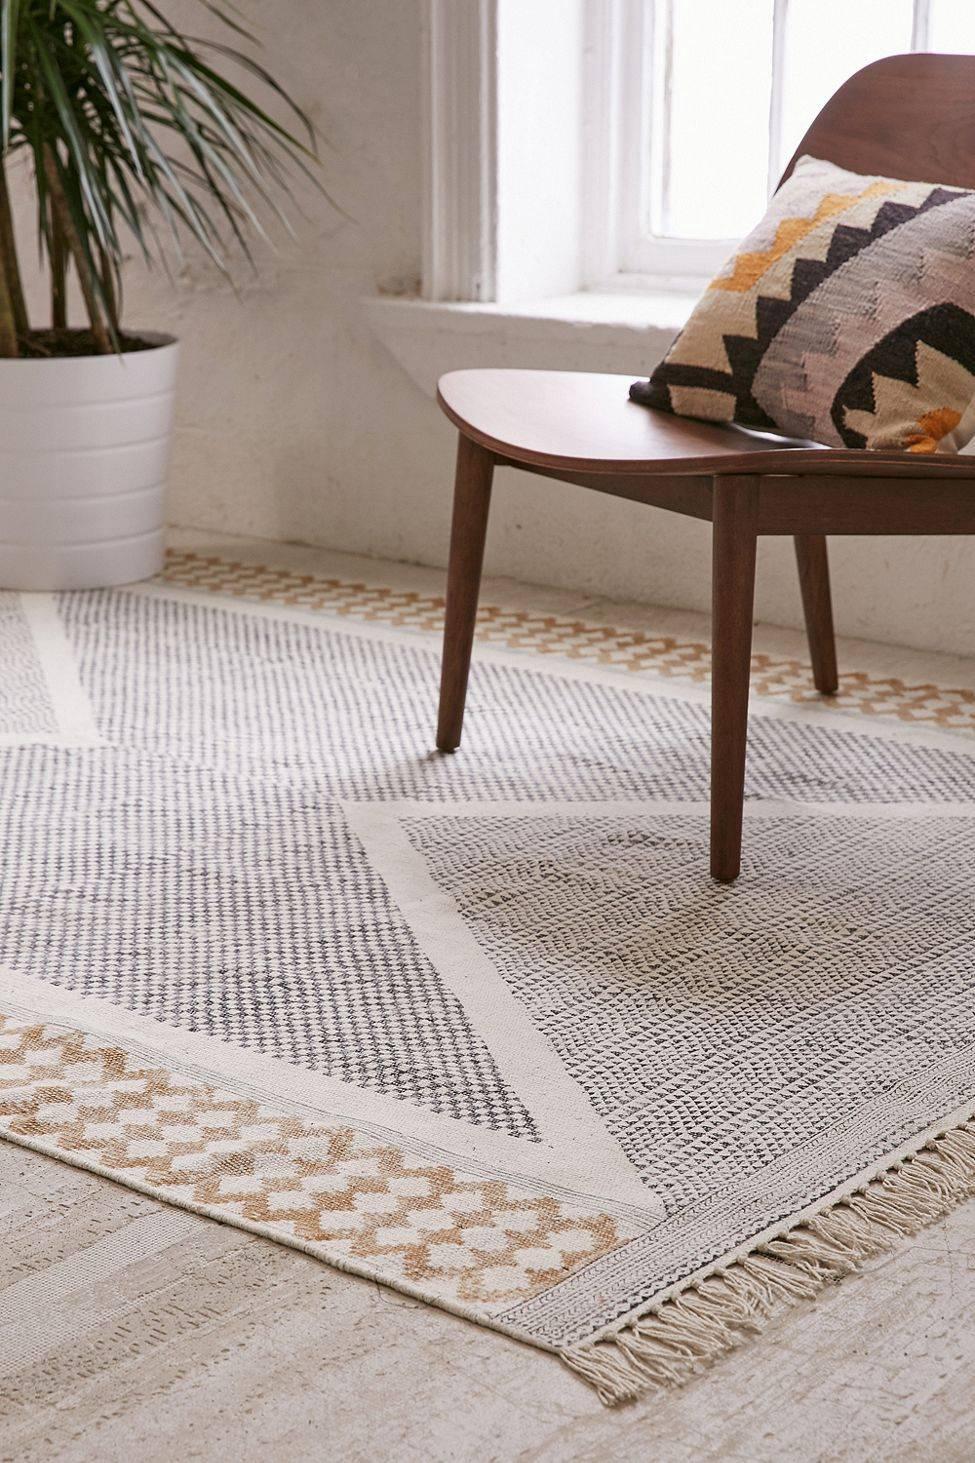 Calissa Block Printed Rug Urban Outfitters Trend Fringe Boho Geo Carpet